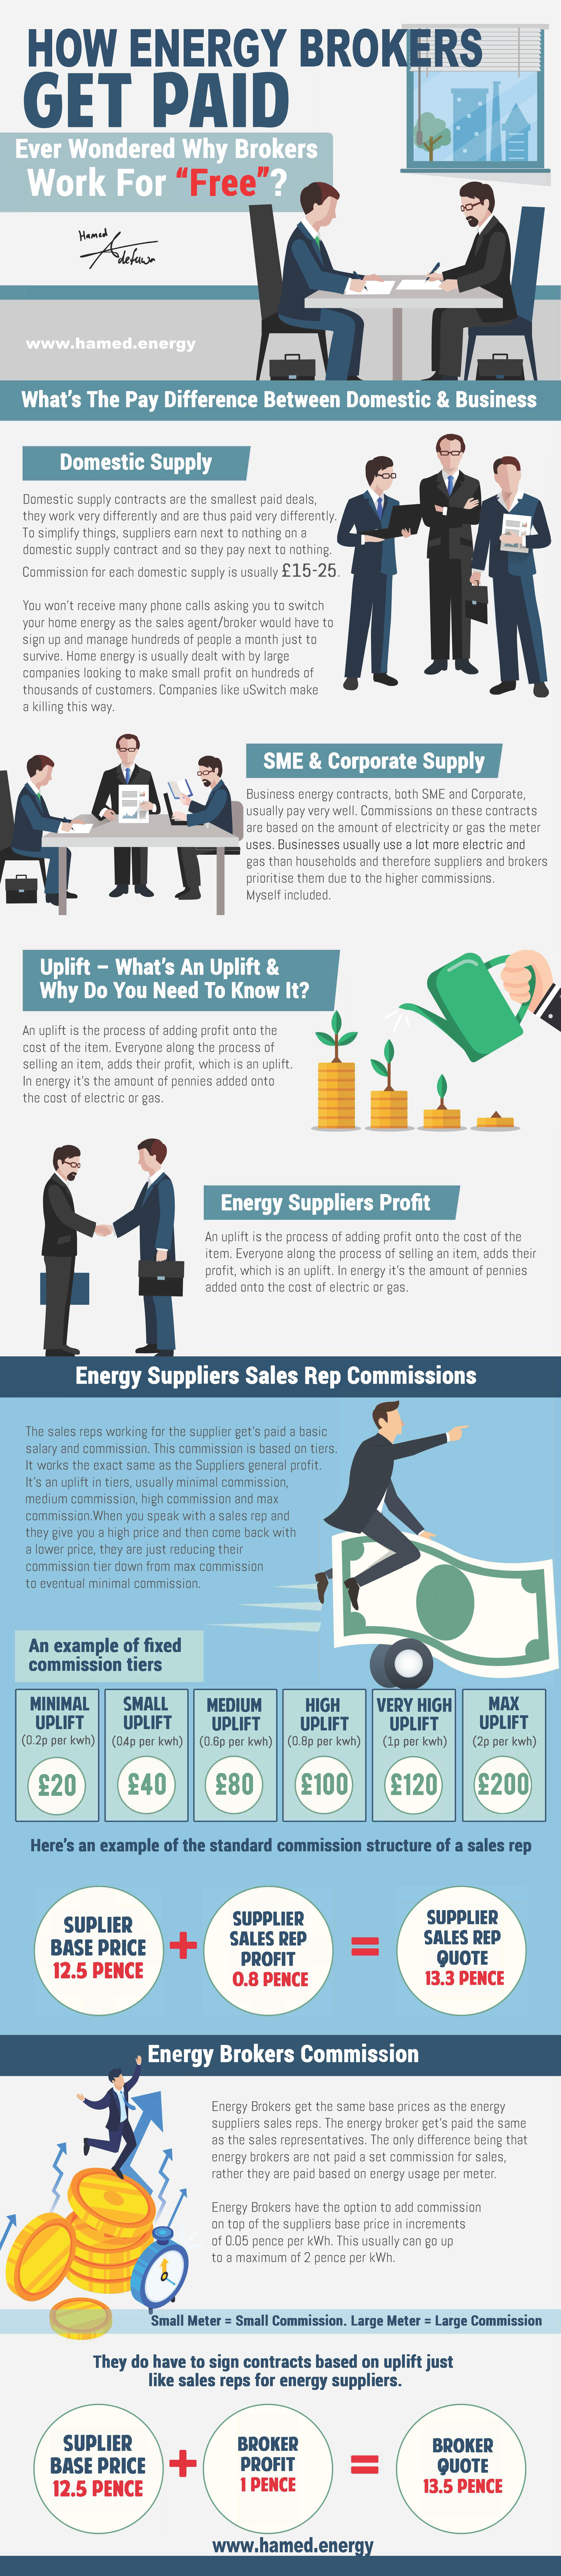 How Energy Brokers Get Paid Energy Energy Suppliers Sales Rep